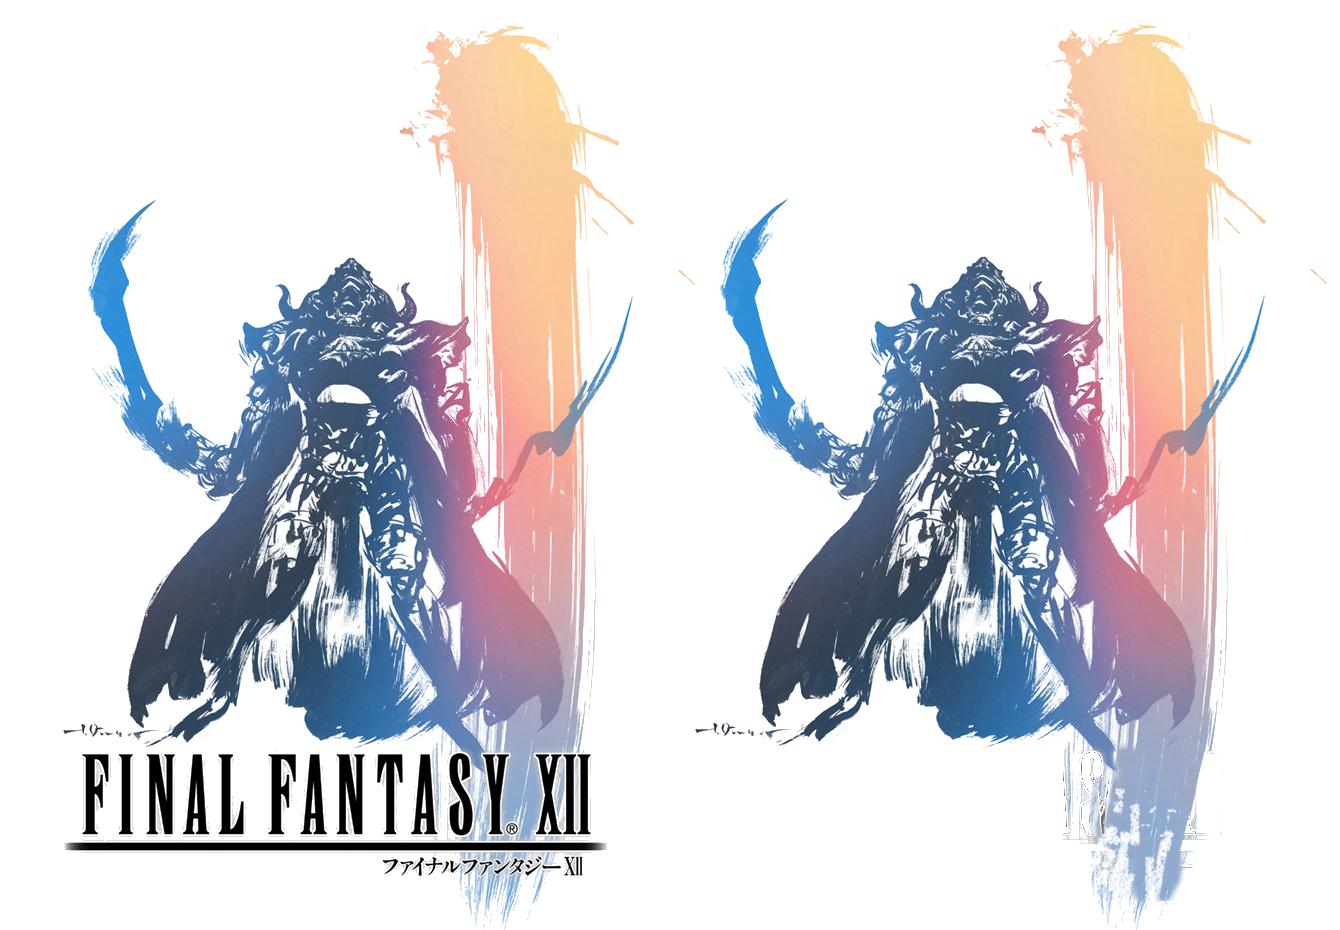 FF12 logo renders by digitaleva on DeviantArt.